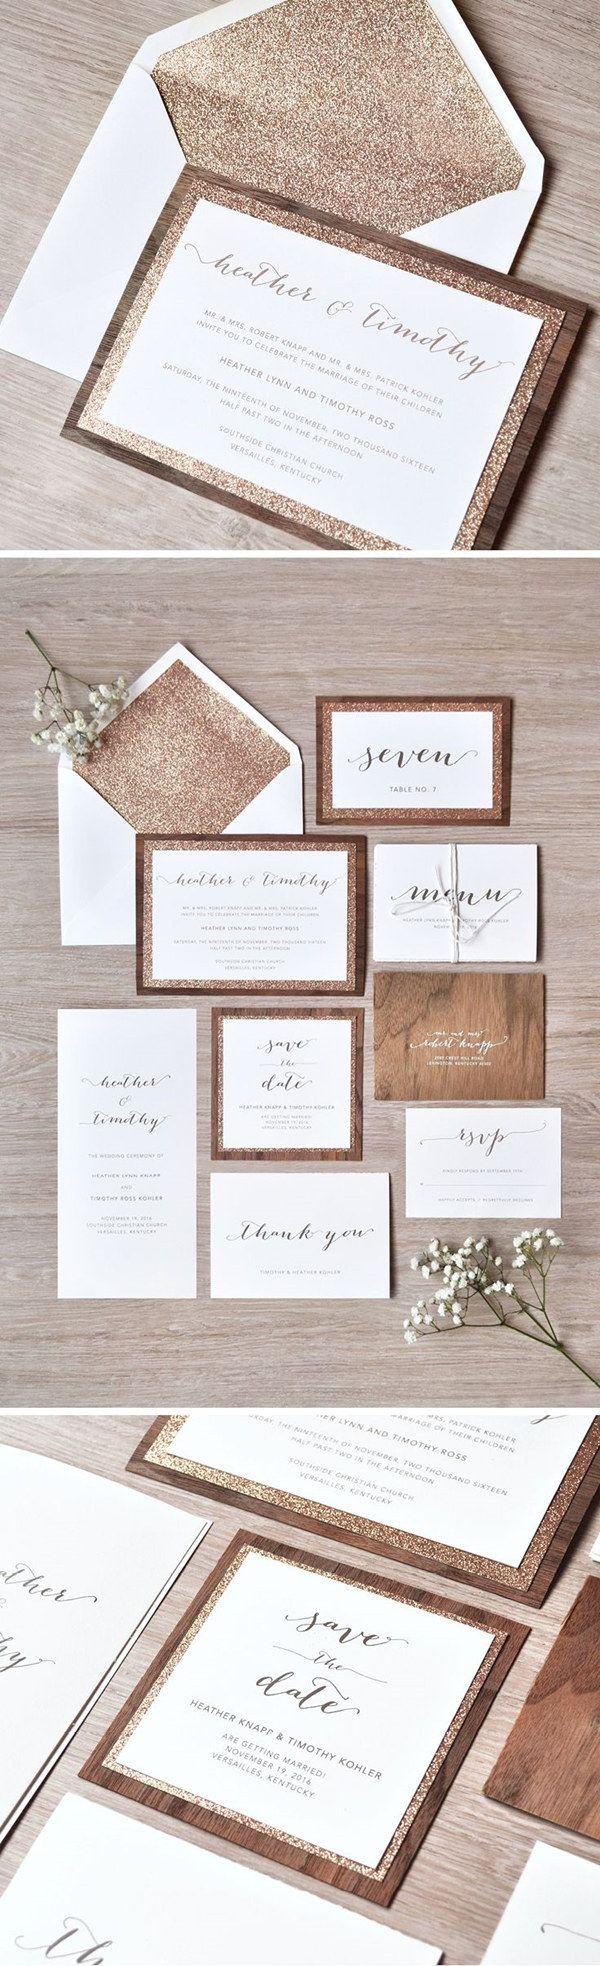 wood wedding invitations wood wedding invitations 10 Hottest Wedding Invitation Trends for